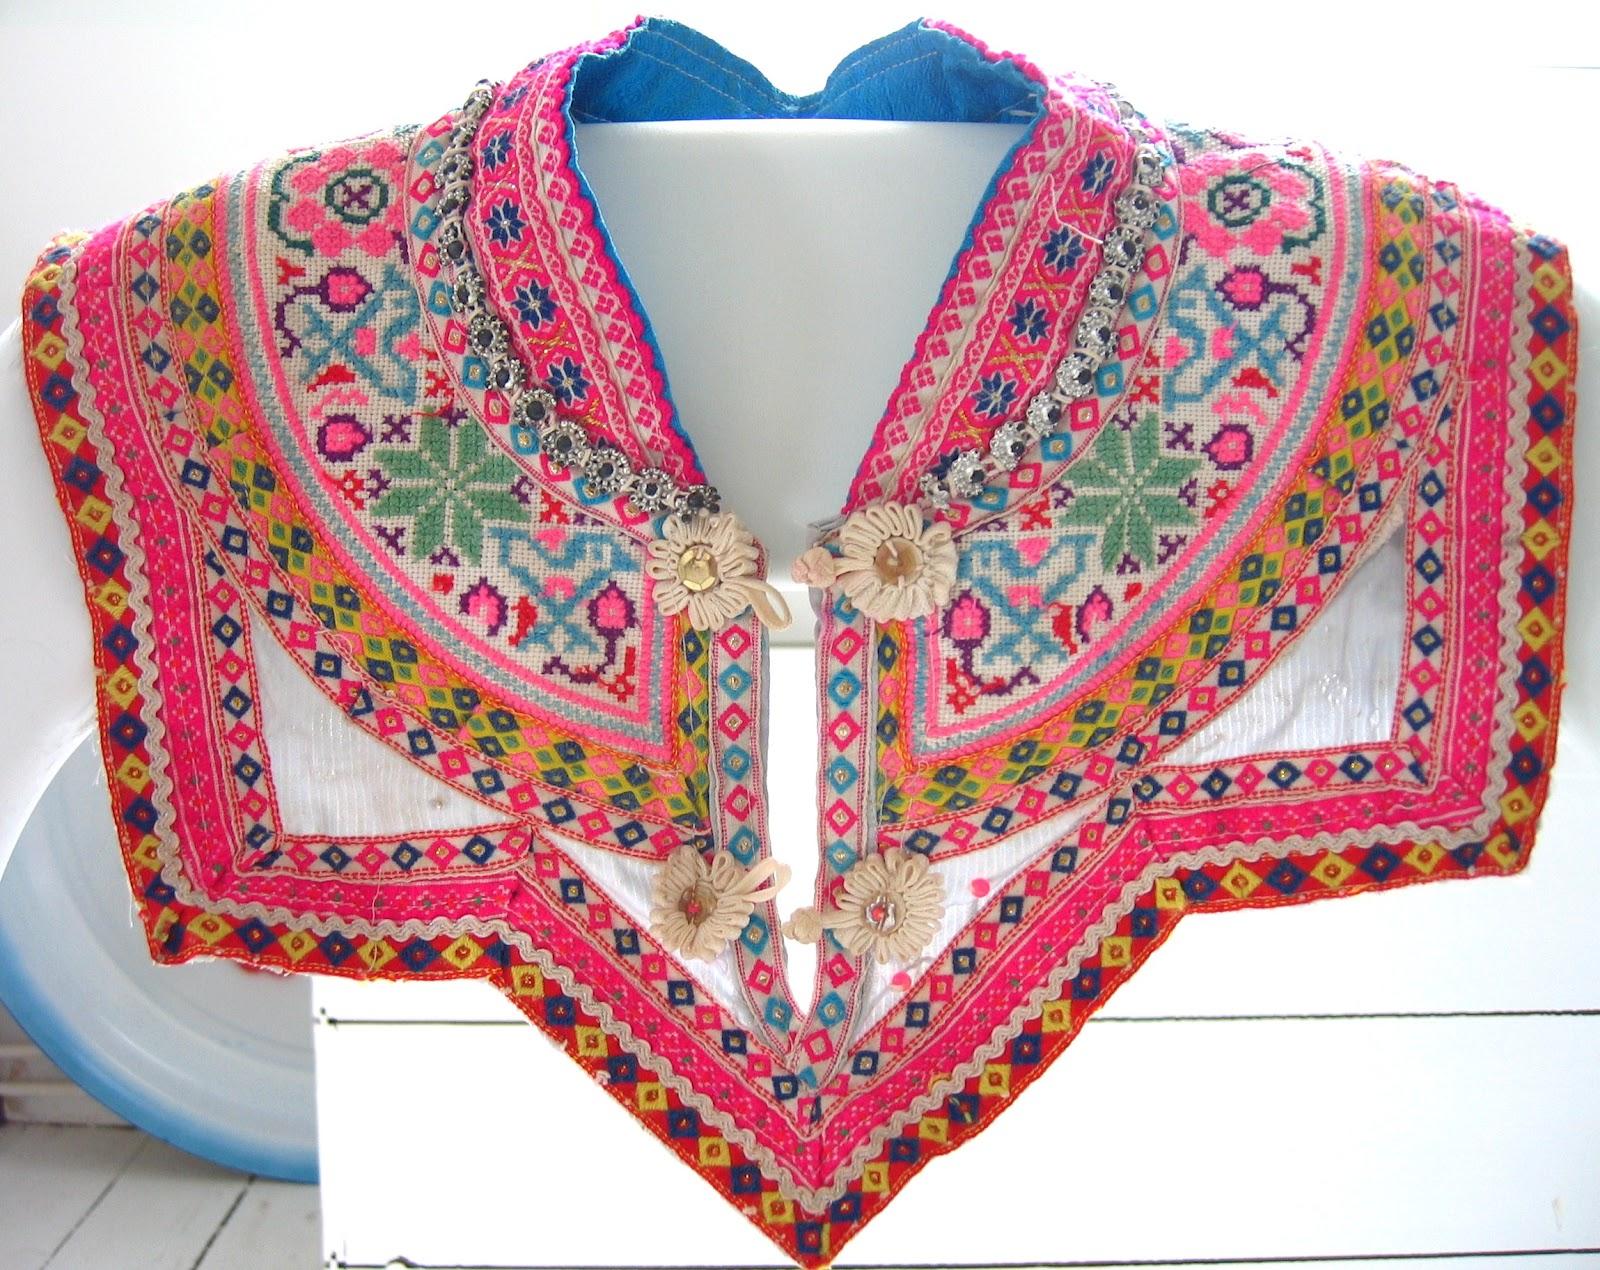 Byhaafner crochet vintage embroidery love from laos